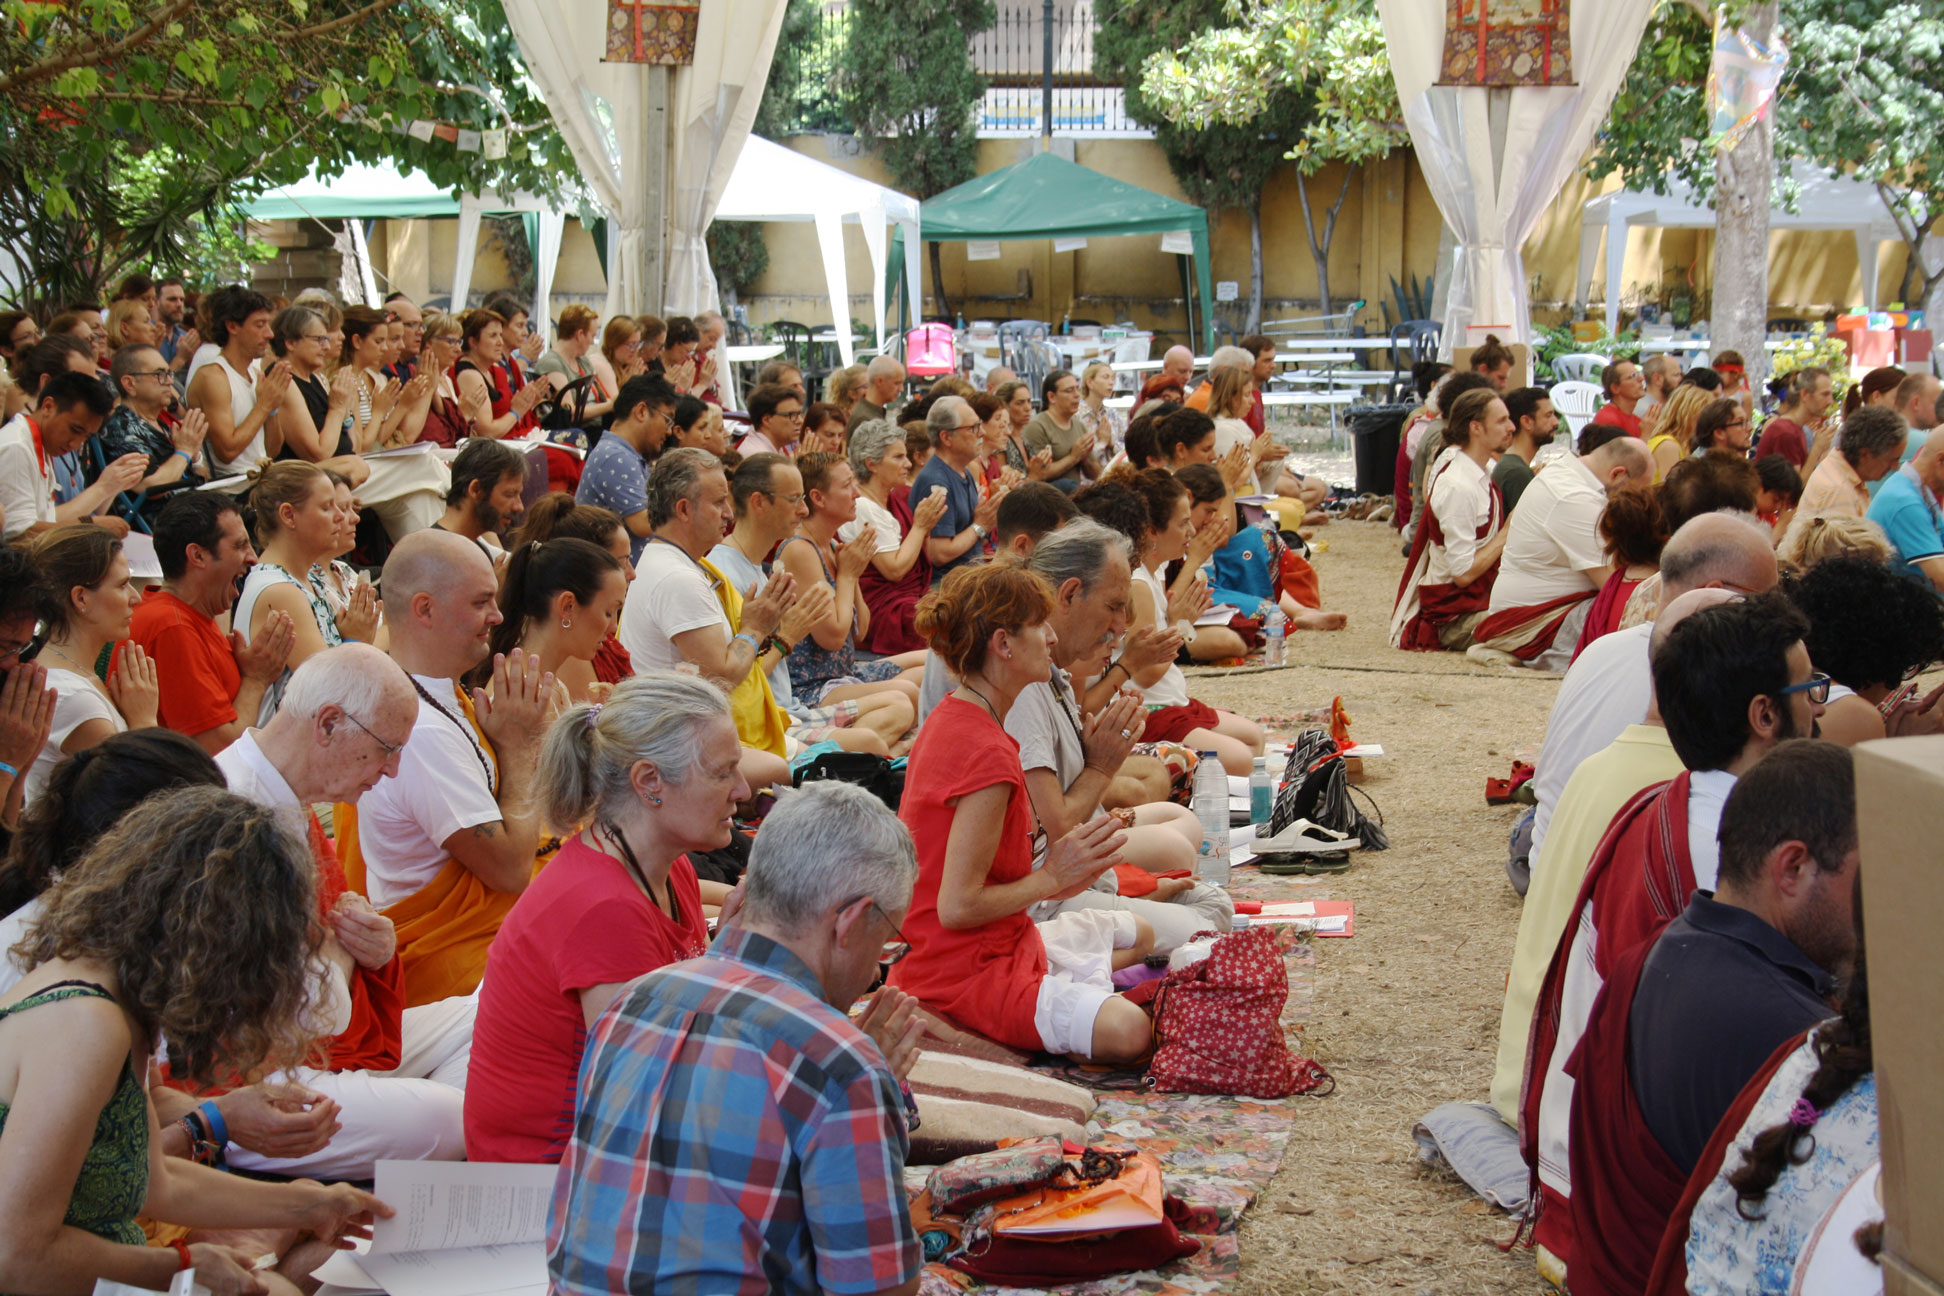 SS-Dudjom-Rinpoche-Sangye-Pema-Zhepa-evento-valencia-julio-2019-7